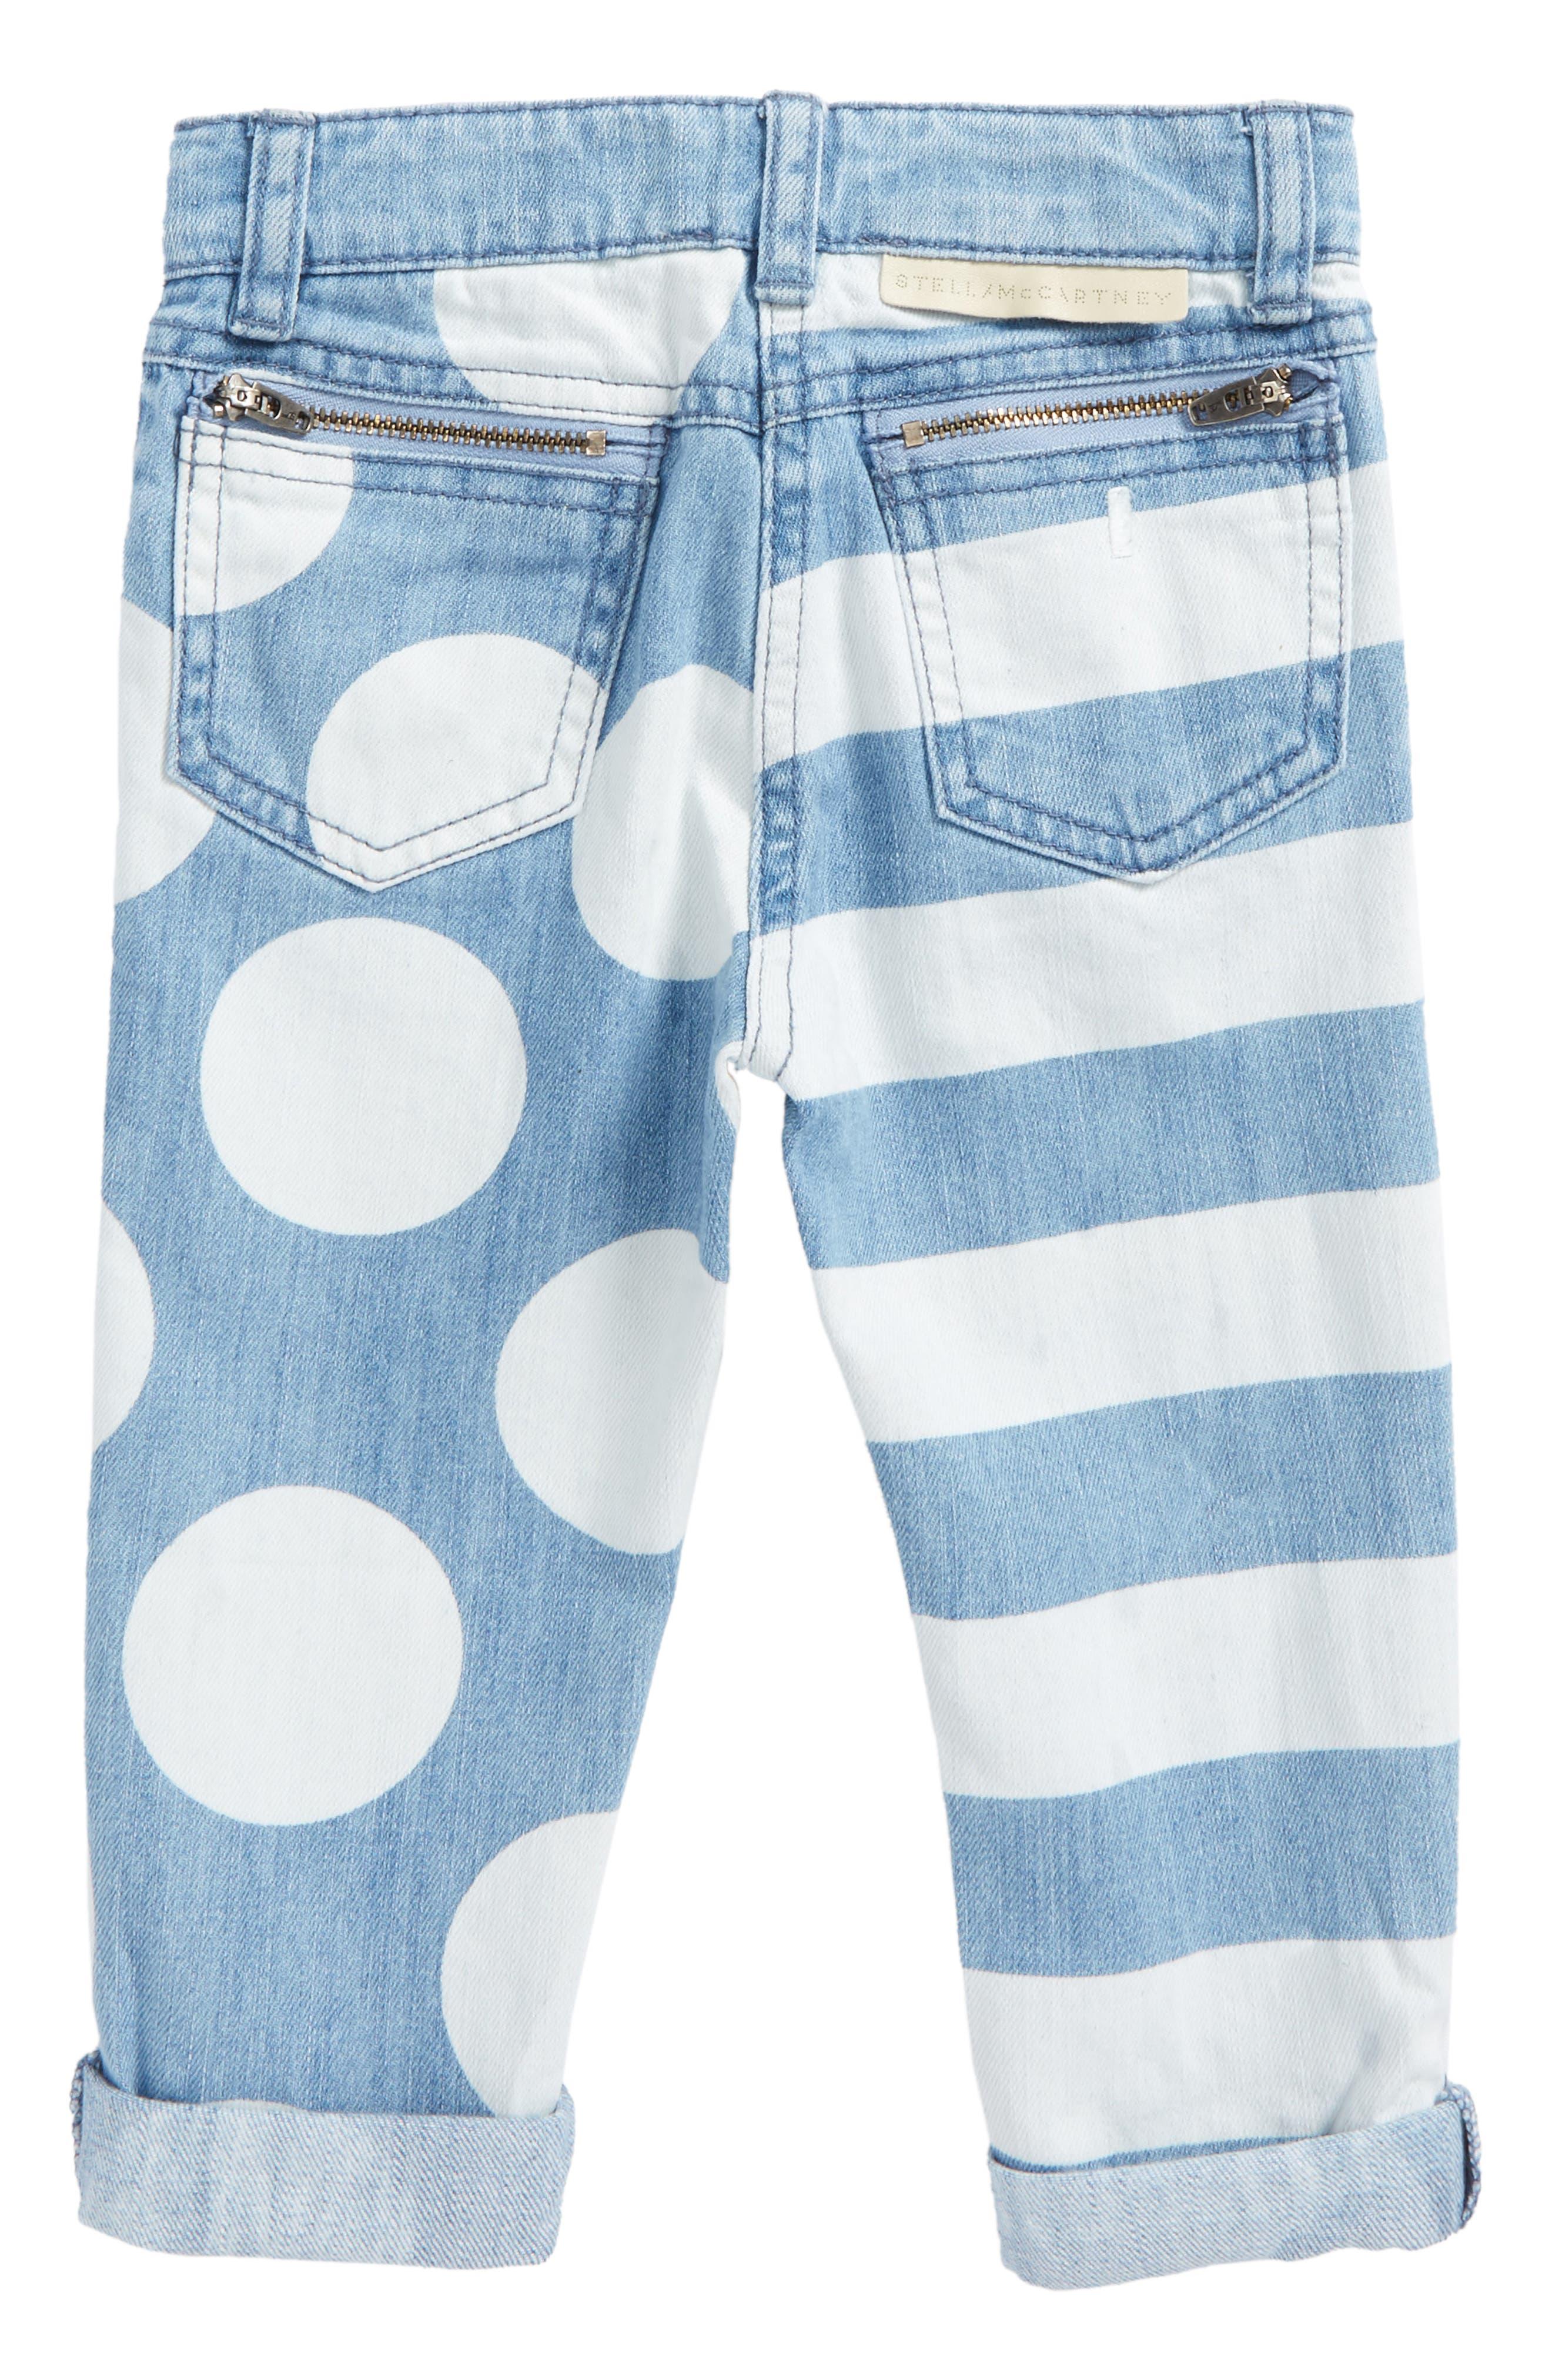 Lohan Stripe & Polka Dot Jeans,                             Alternate thumbnail 2, color,                             Printed Denim